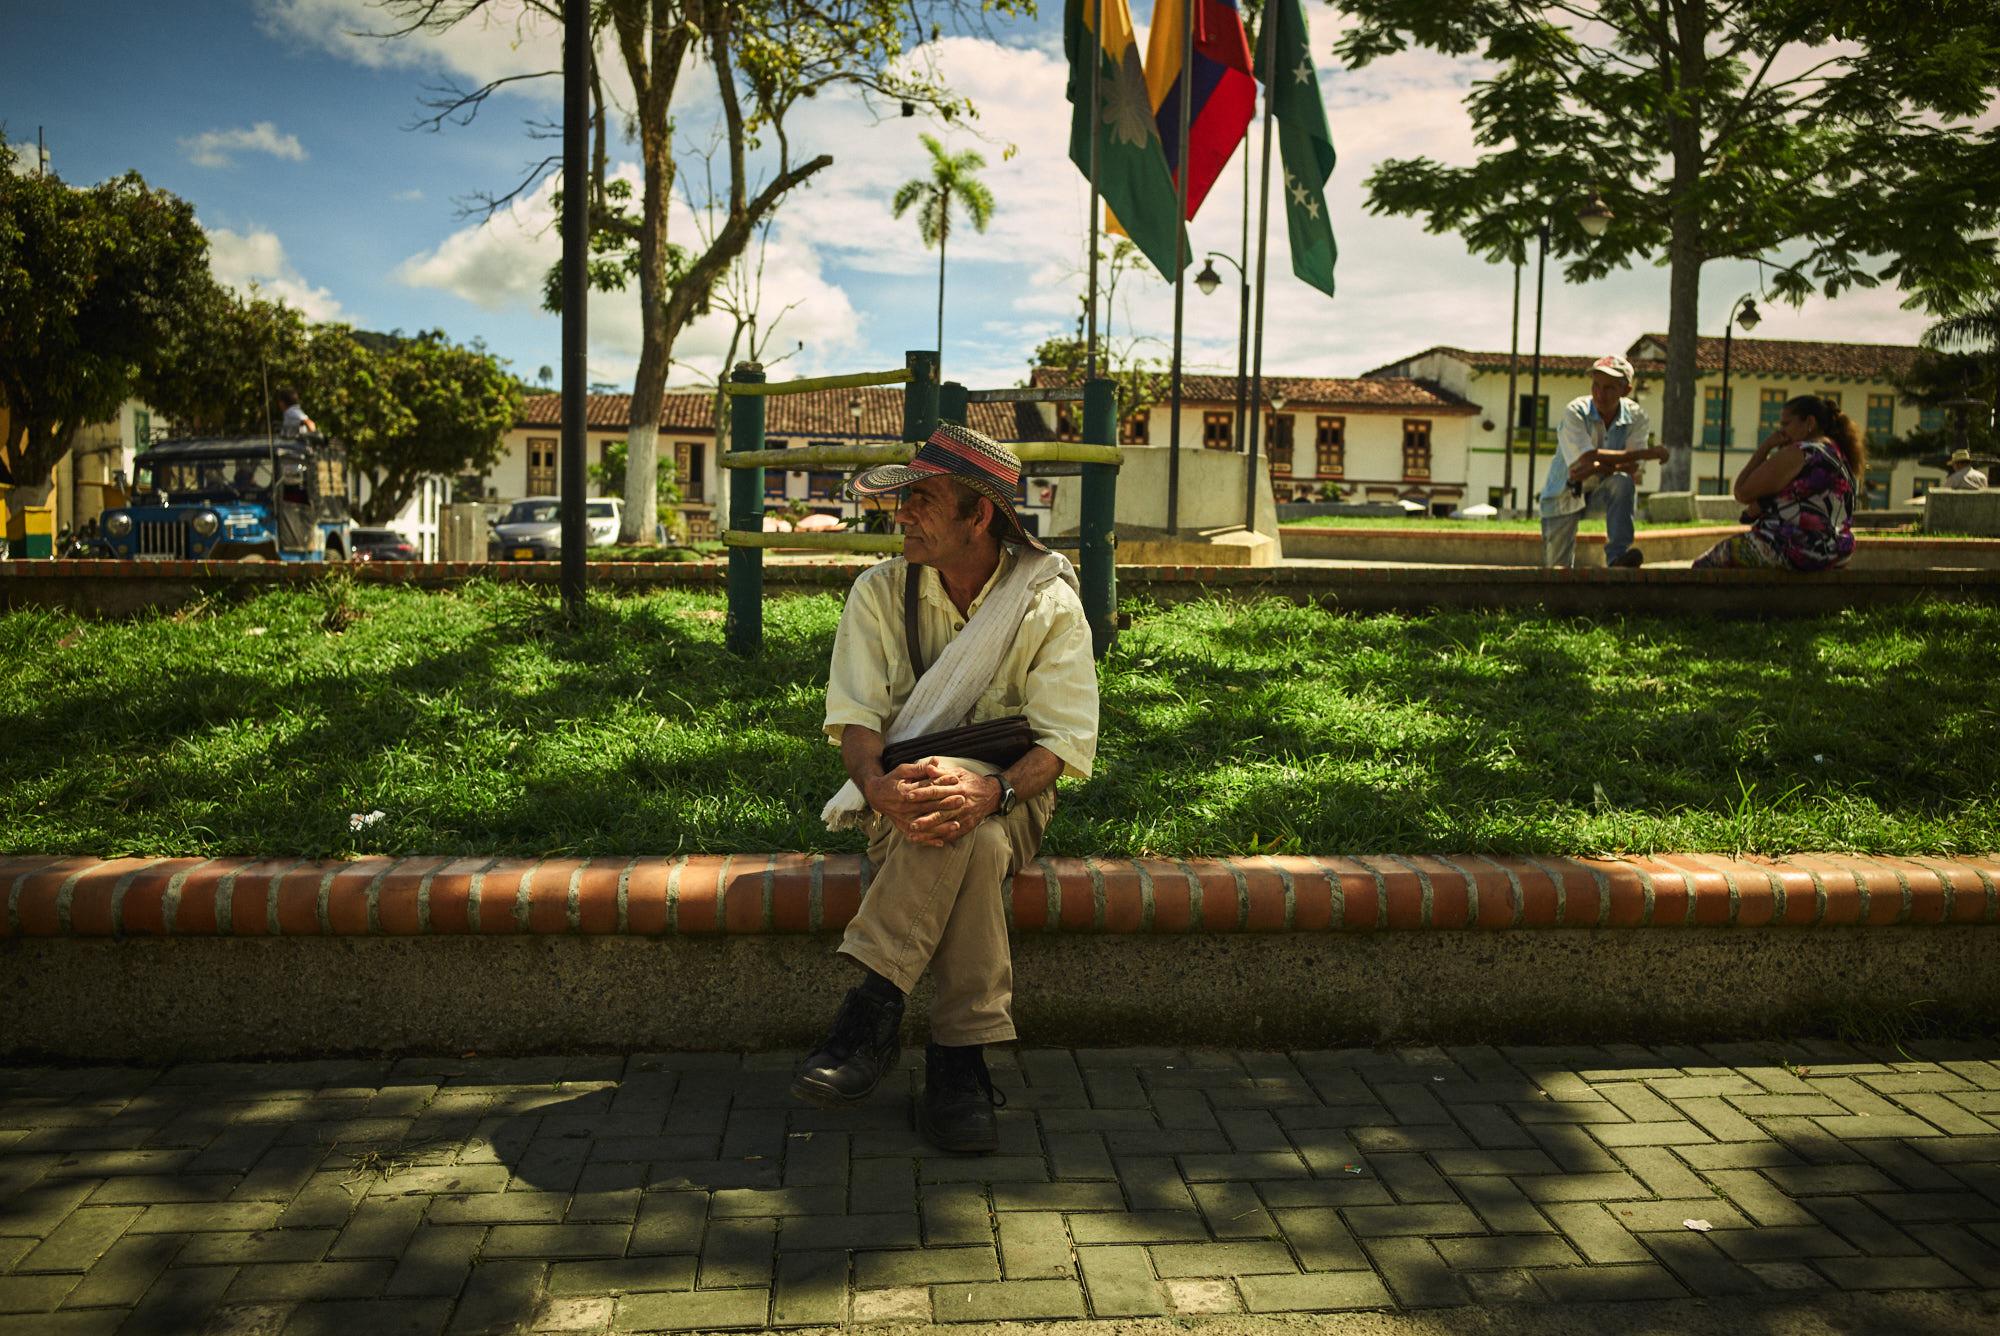 LOWRES-RADRACE-COLUMBIA-2018-CARLOS-2712.jpg